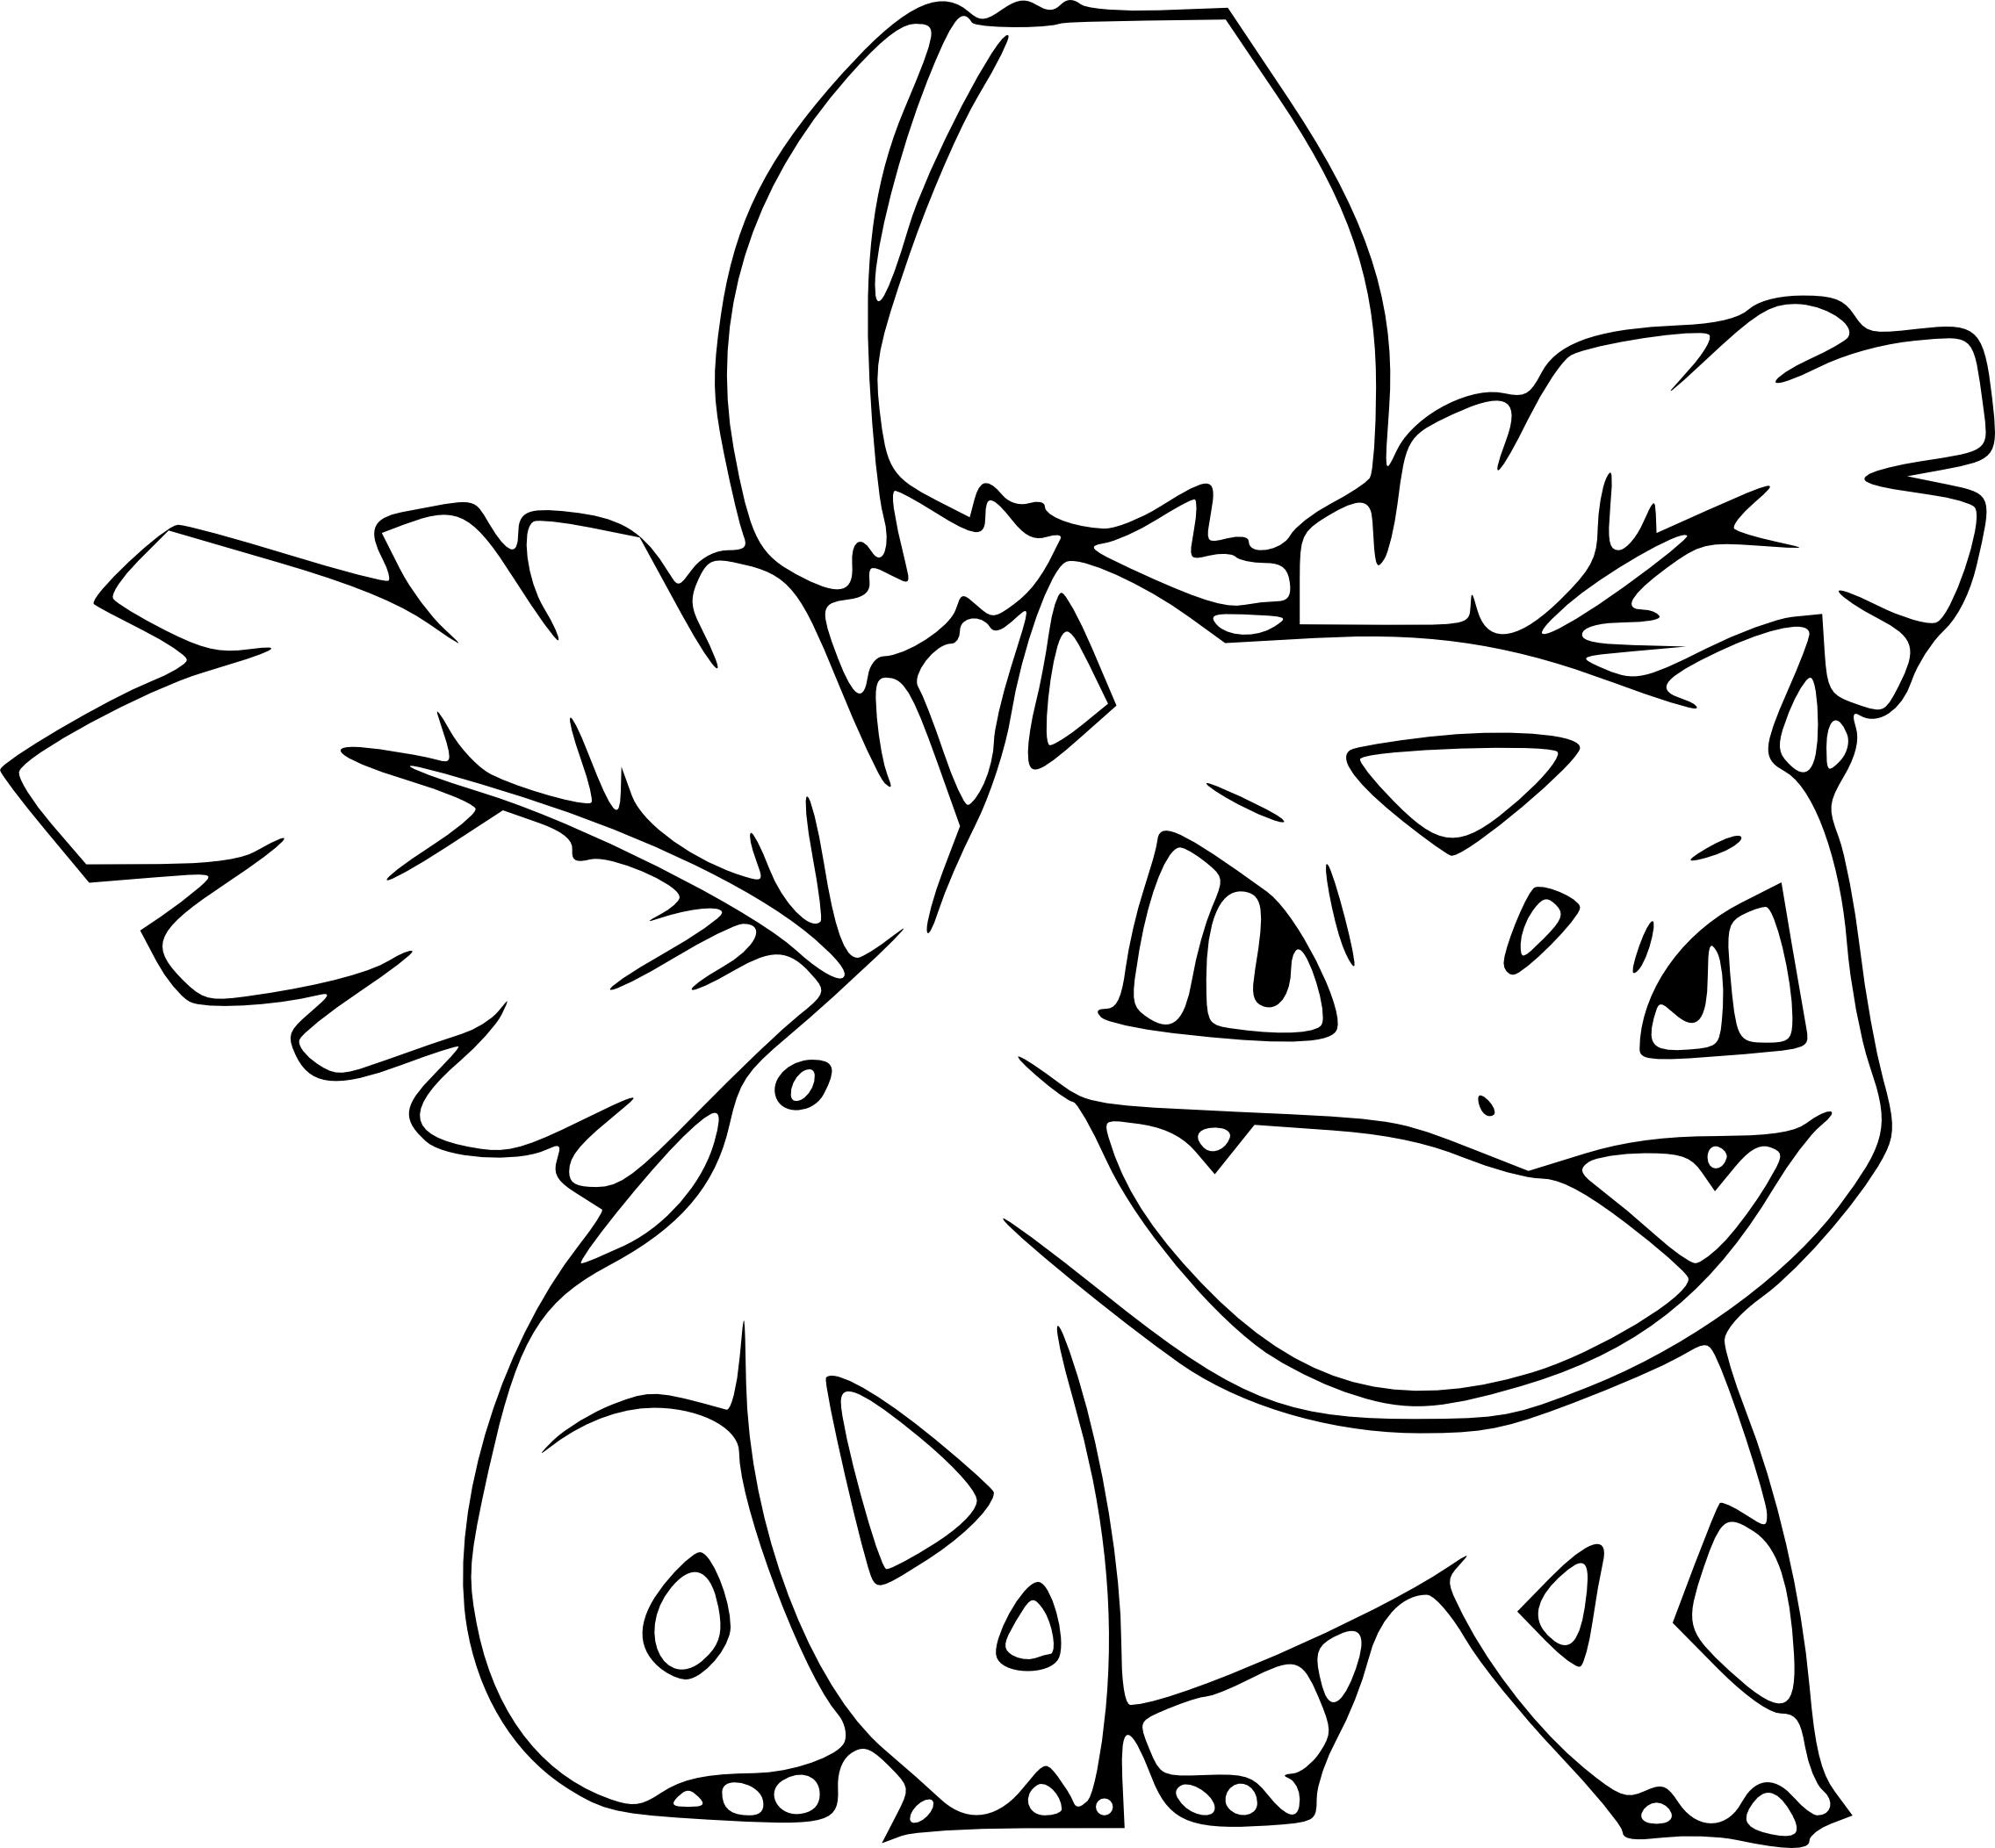 Meilleur de dessin a imprimer pokemon tortank - Dessin de pokemon a imprimer ...